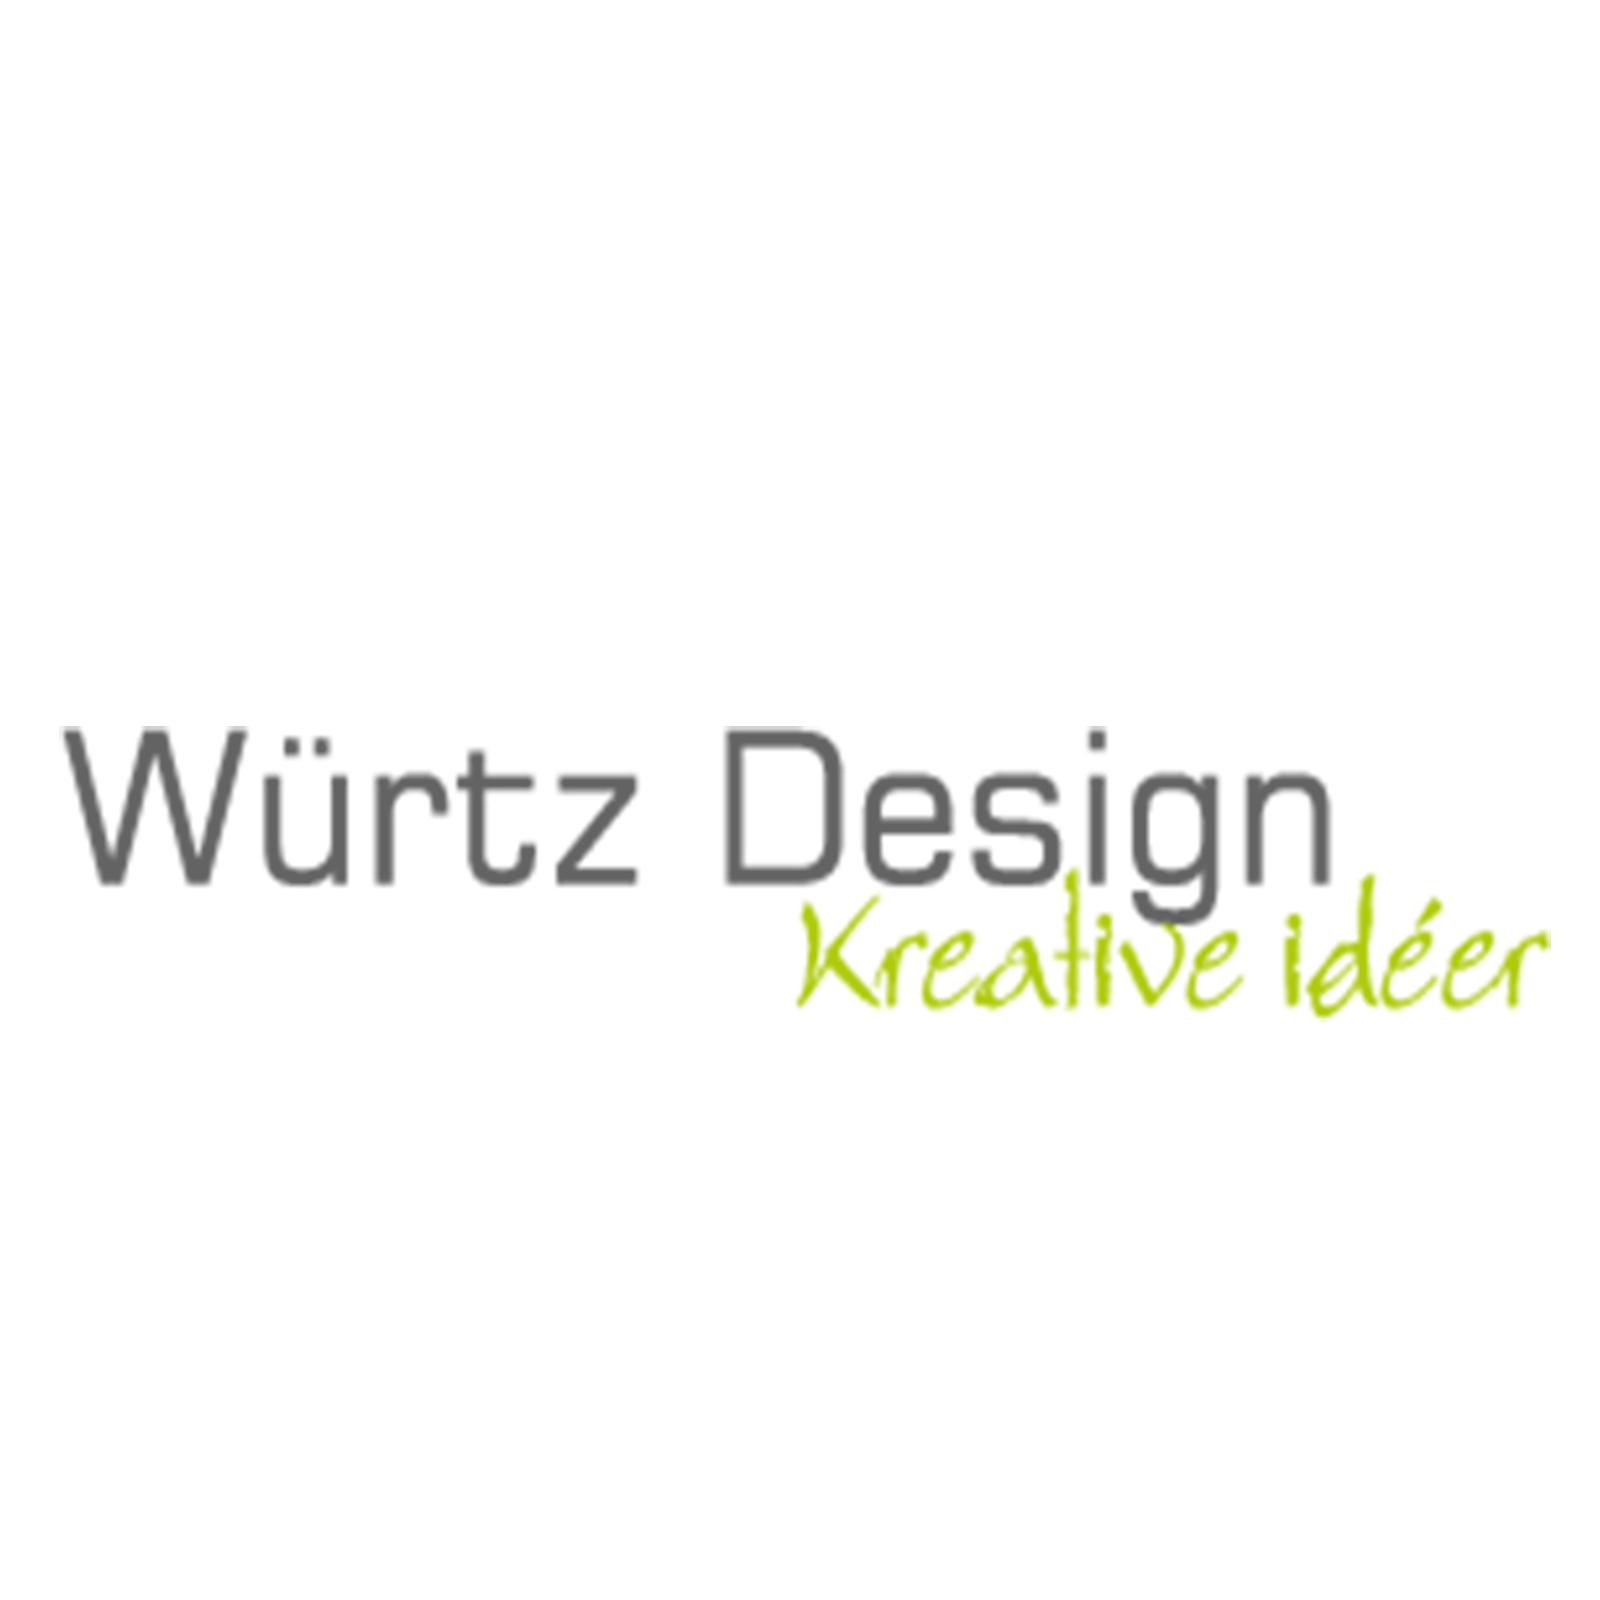 Wurtz design - kreative ideer